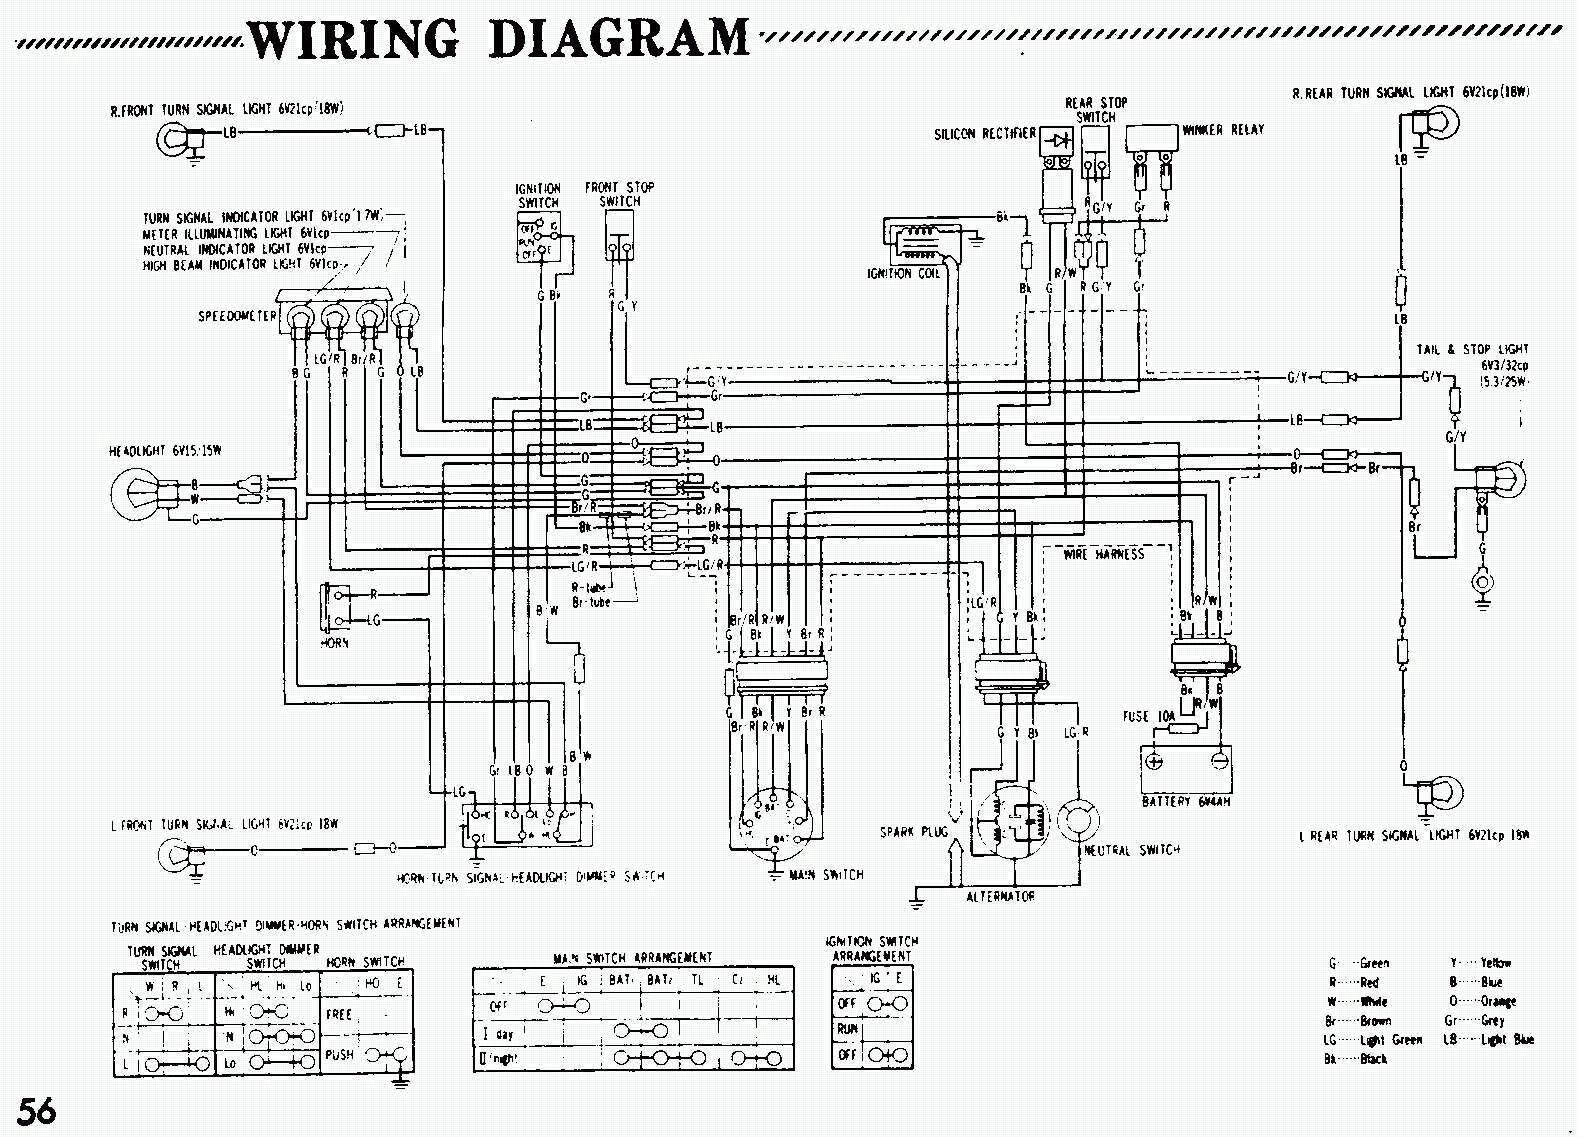 Diagram Honda Xl70 Wiring Diagram Full Version Hd Quality Wiring Diagram Diagramshulda Scuoladipace It